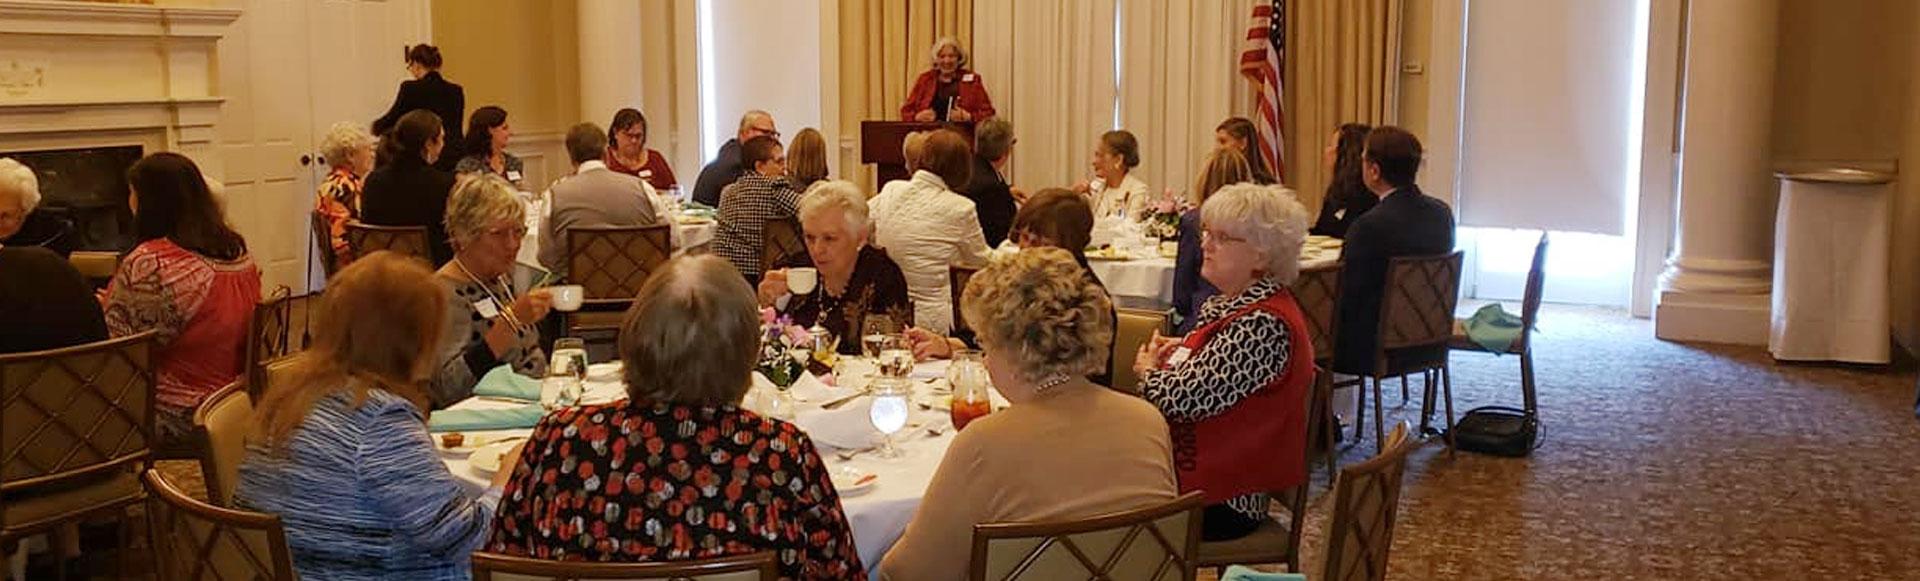 The Women's Club of Jacksonville, Inc.